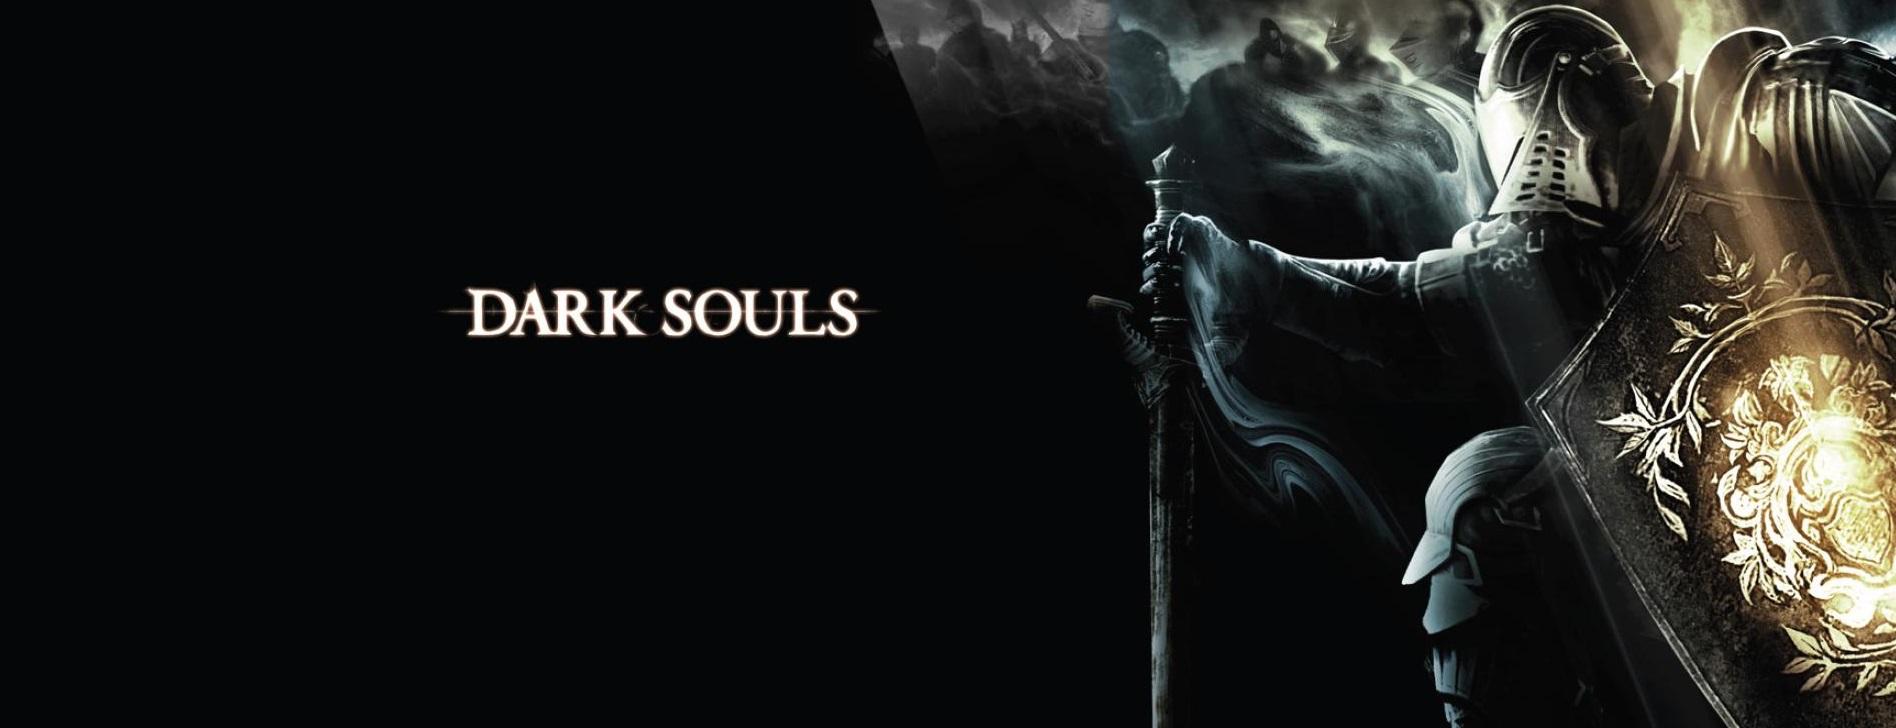 36479_dark_soulsx5s3k.jpg